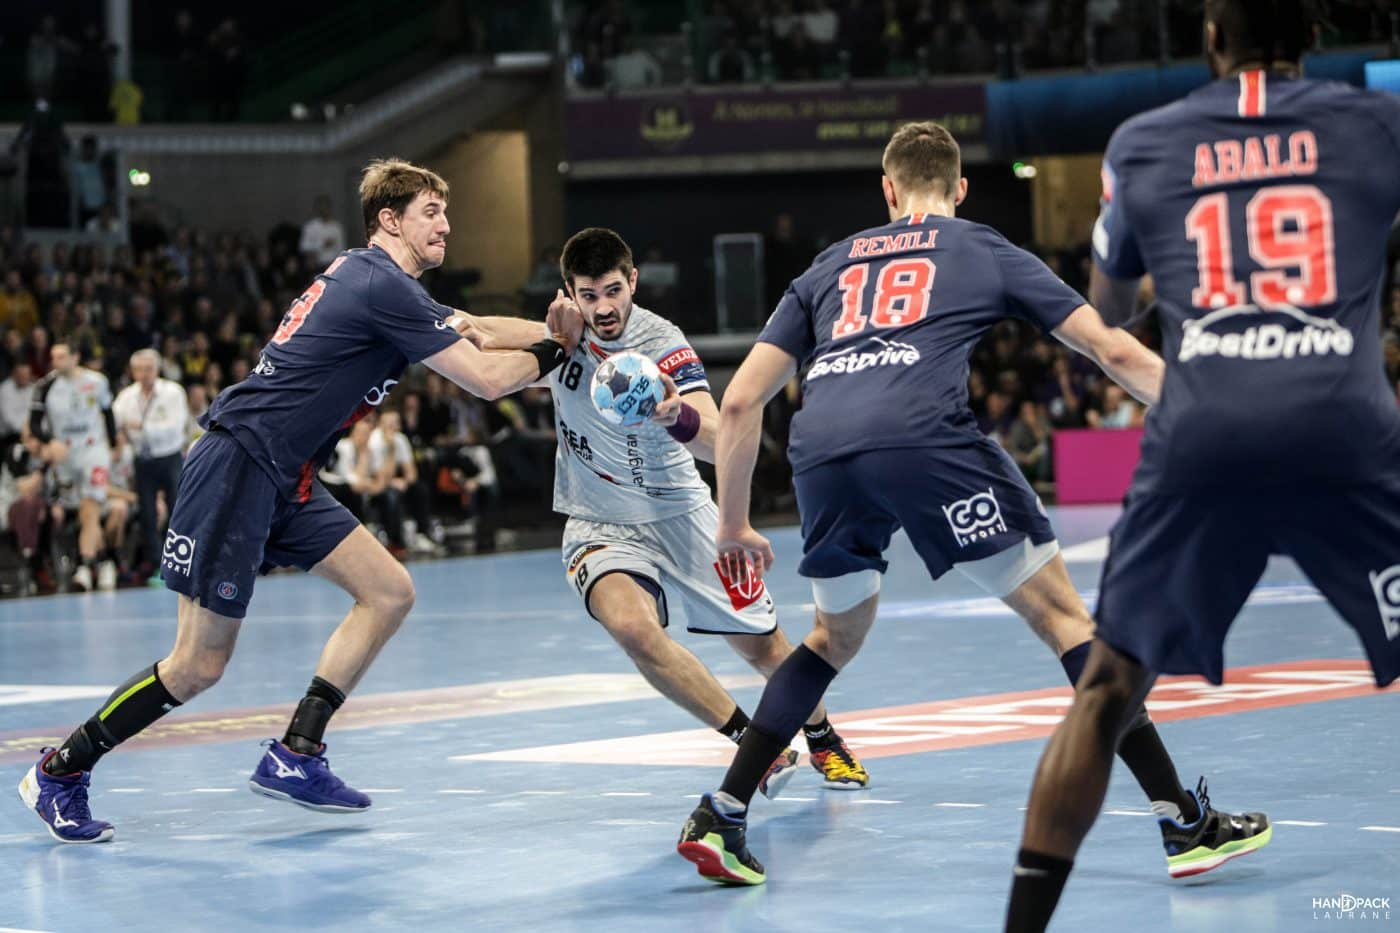 hbc-nantes-paris-saint-germain-handball-ligue-des-champions-2019-handpack-8